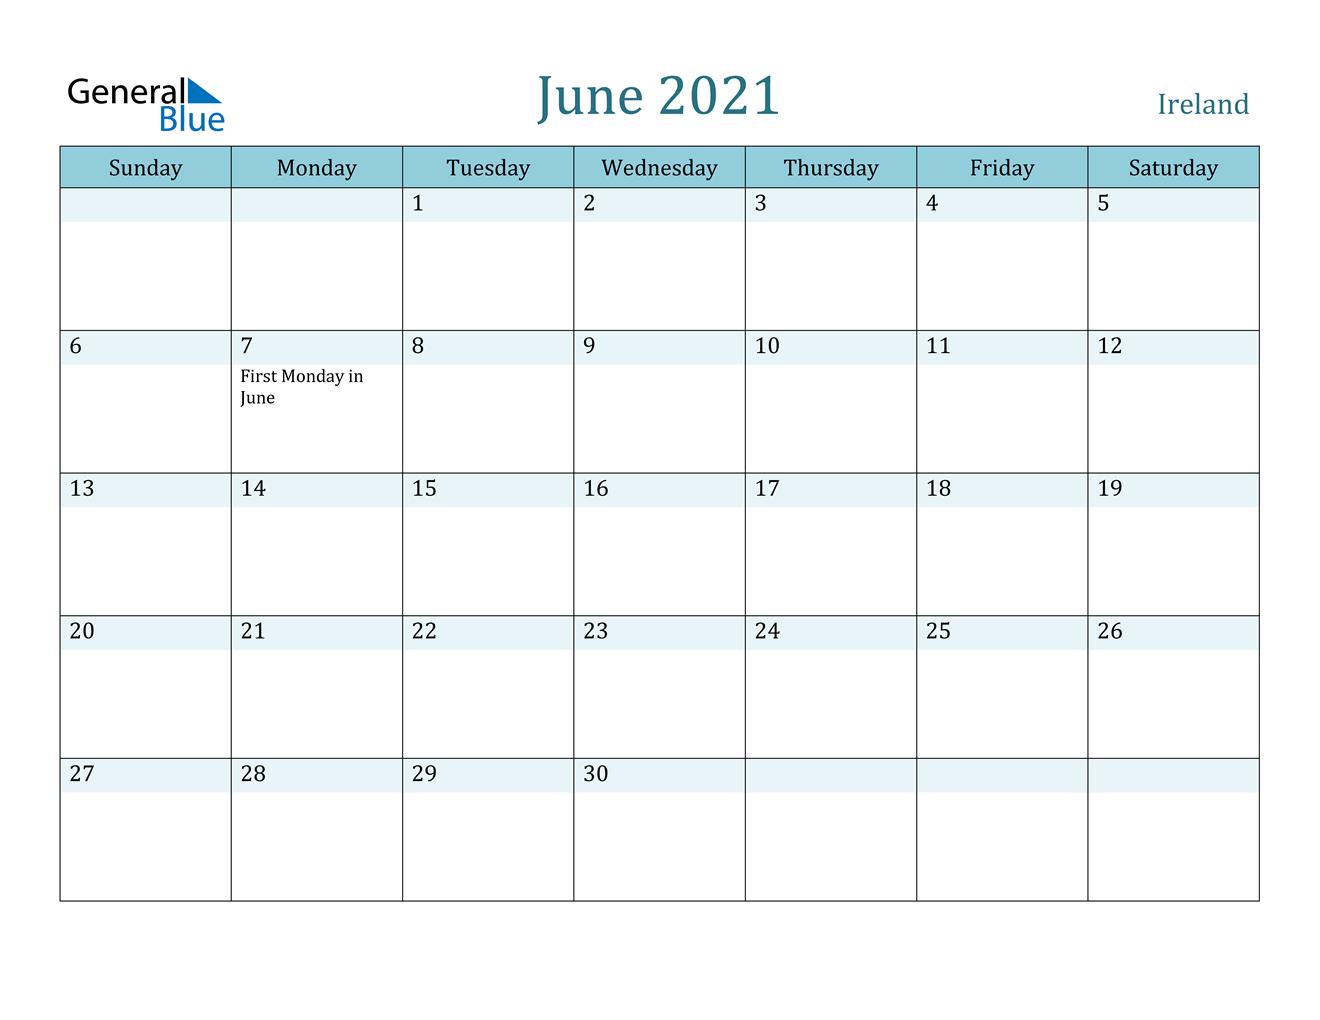 June 2021 Calendar - Ireland